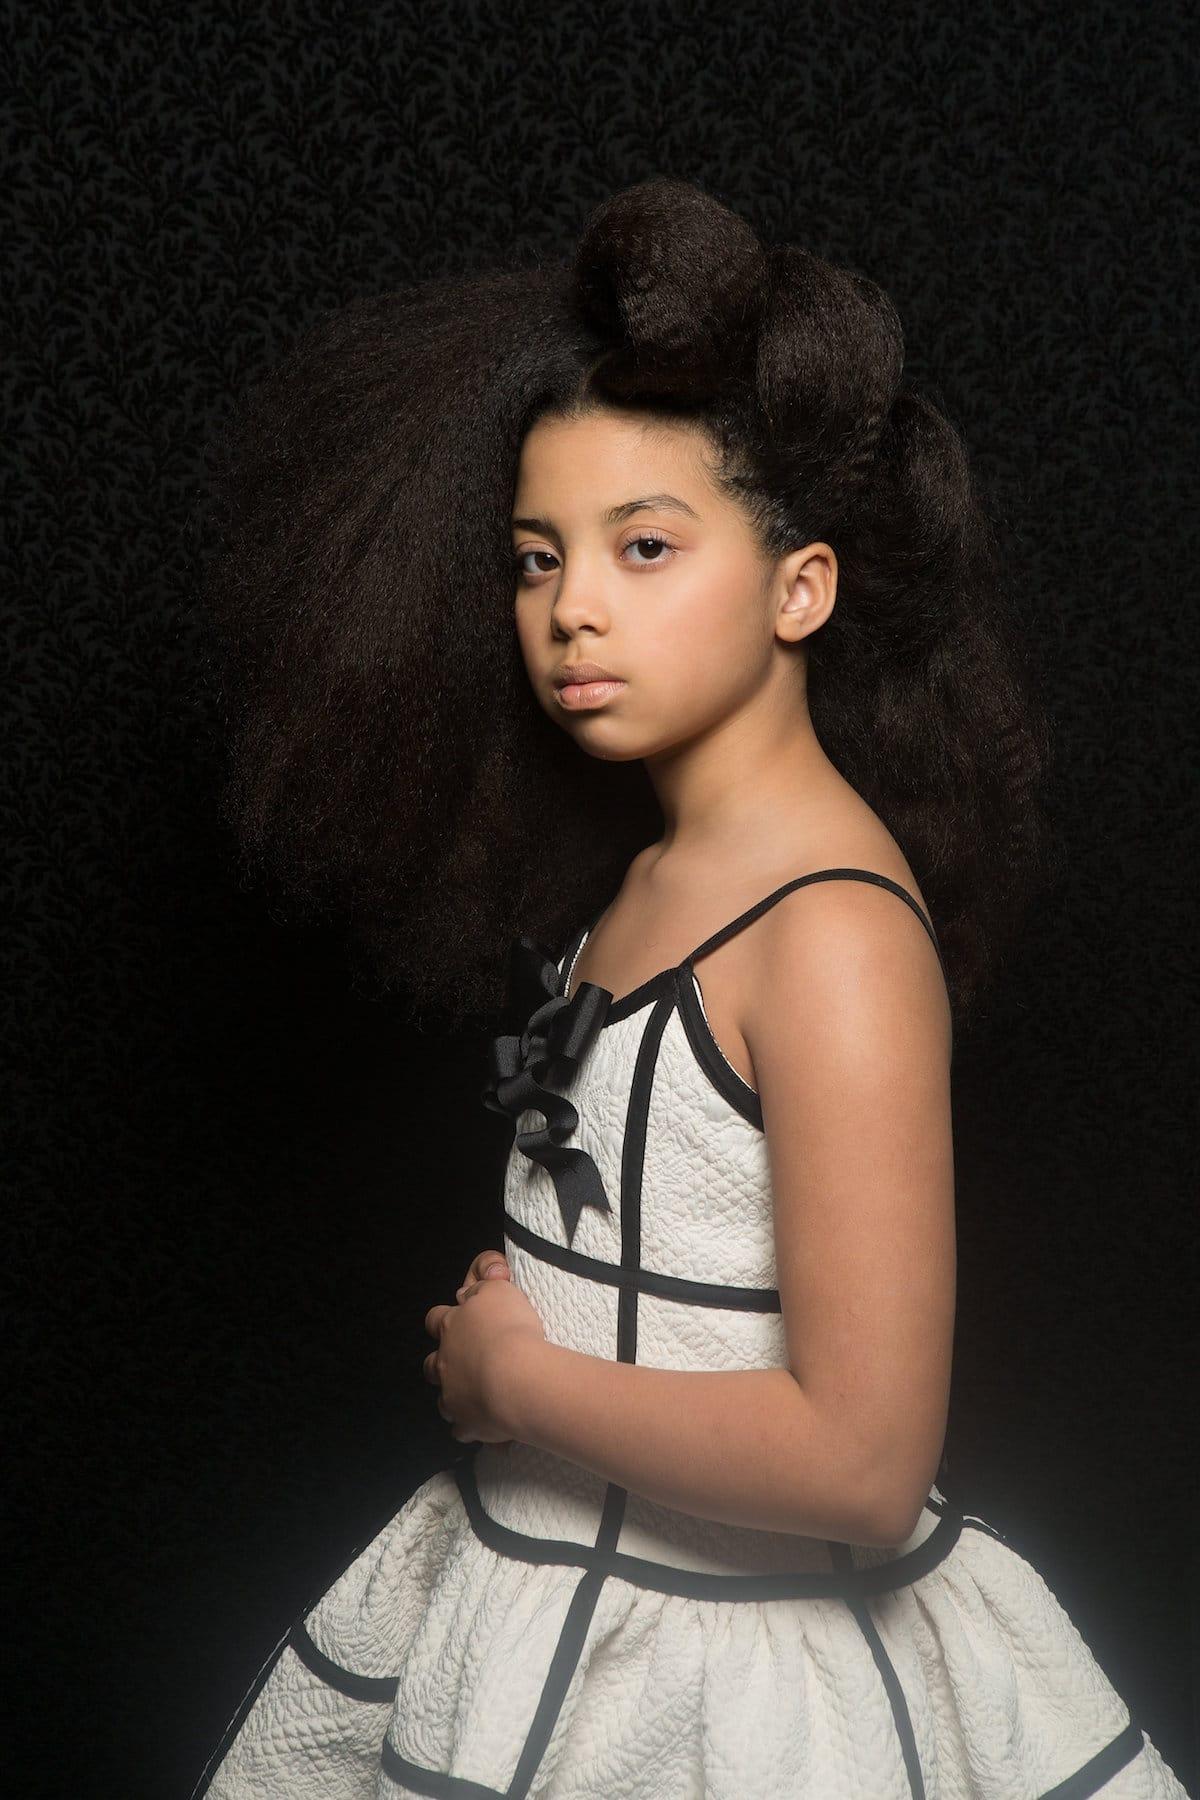 Afro-art-creative-soul-photography-8.jpg